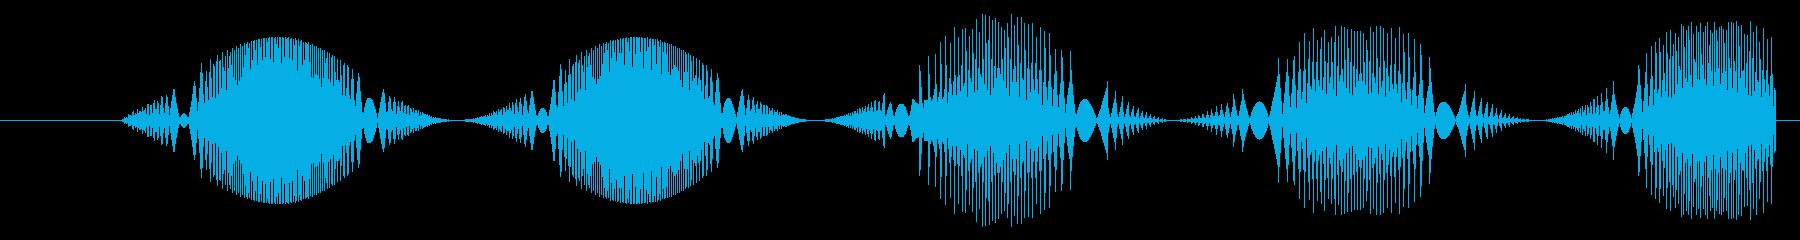 FX シンセ振動01の再生済みの波形